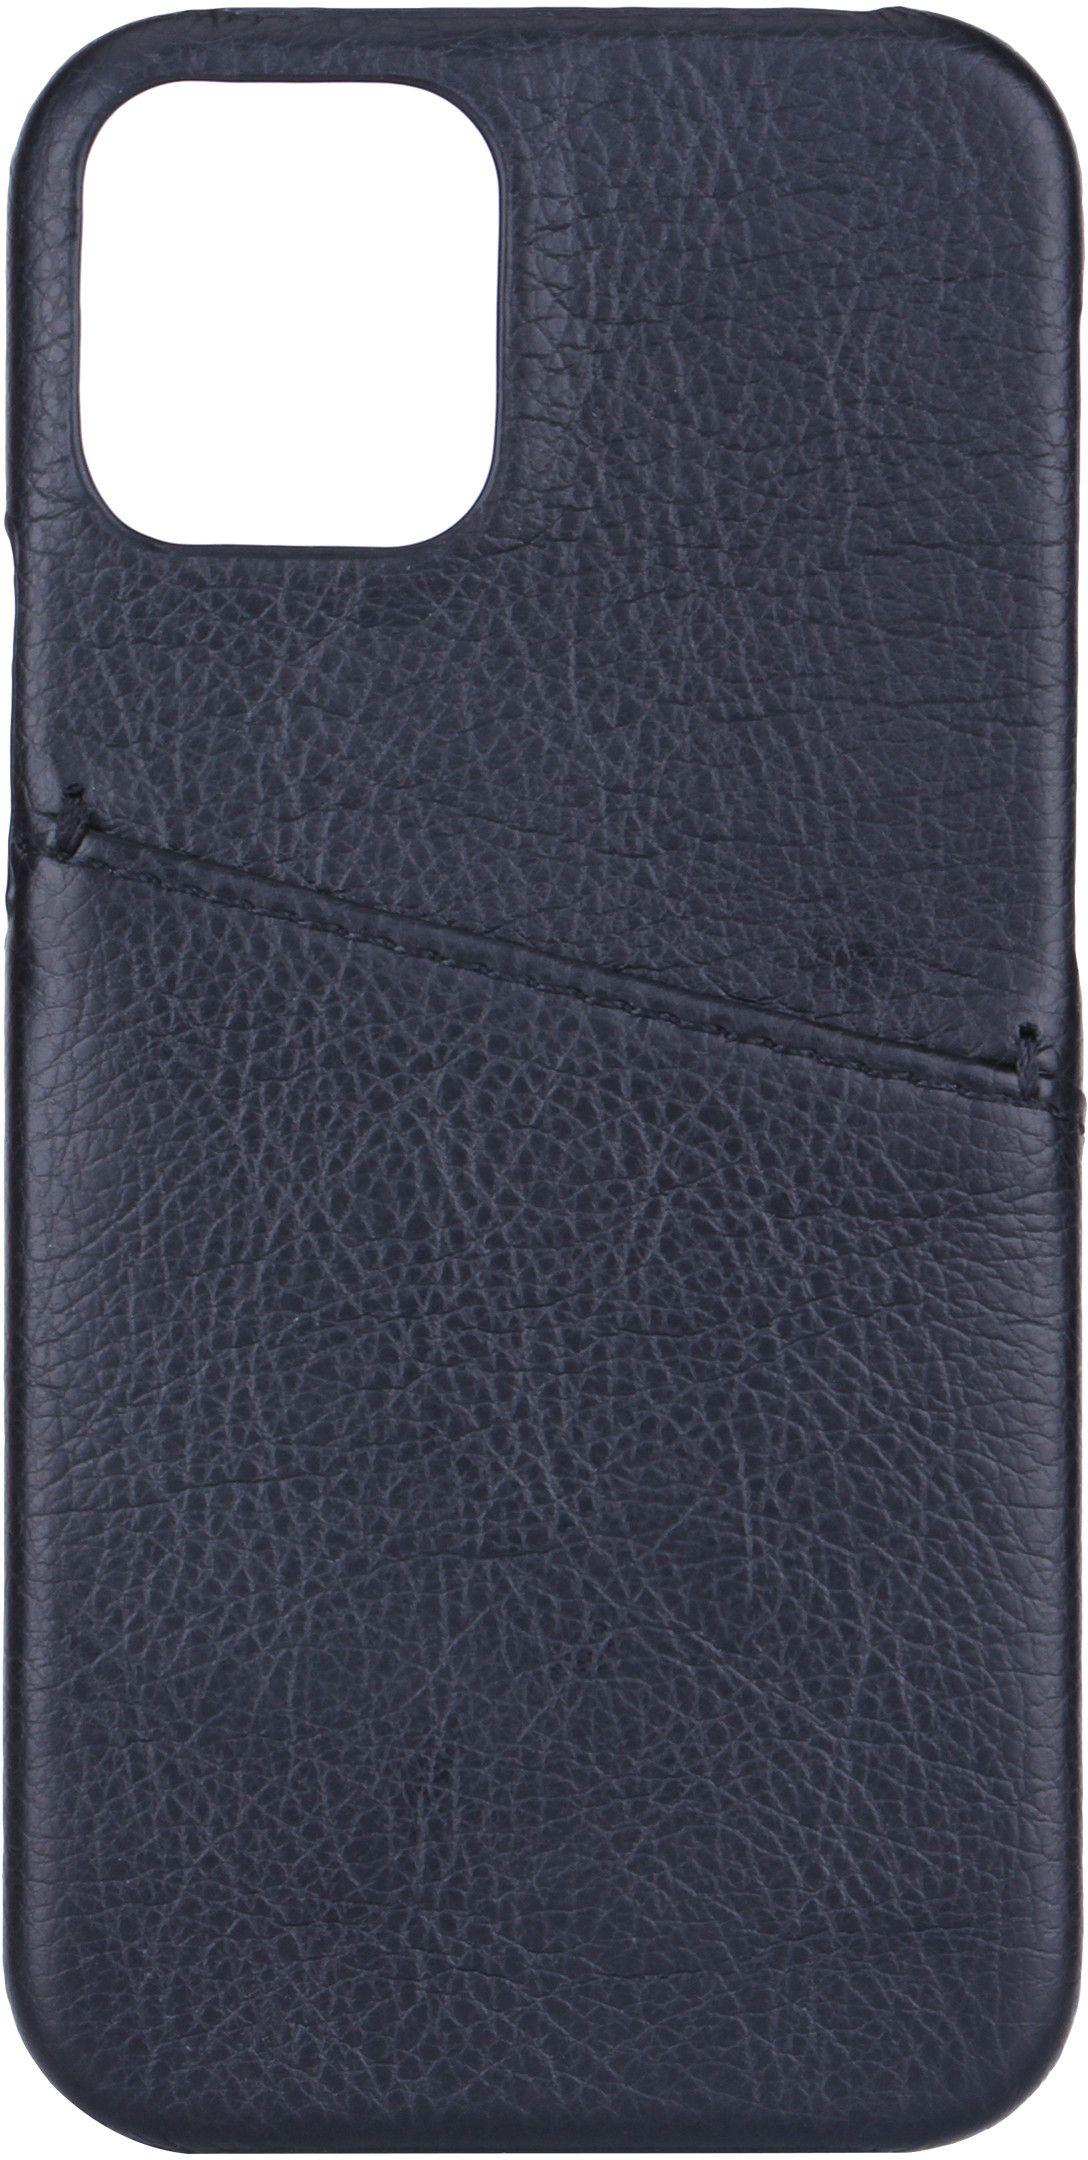 Gear Onsala One Card Case (iPhone 12 mini) - Brun